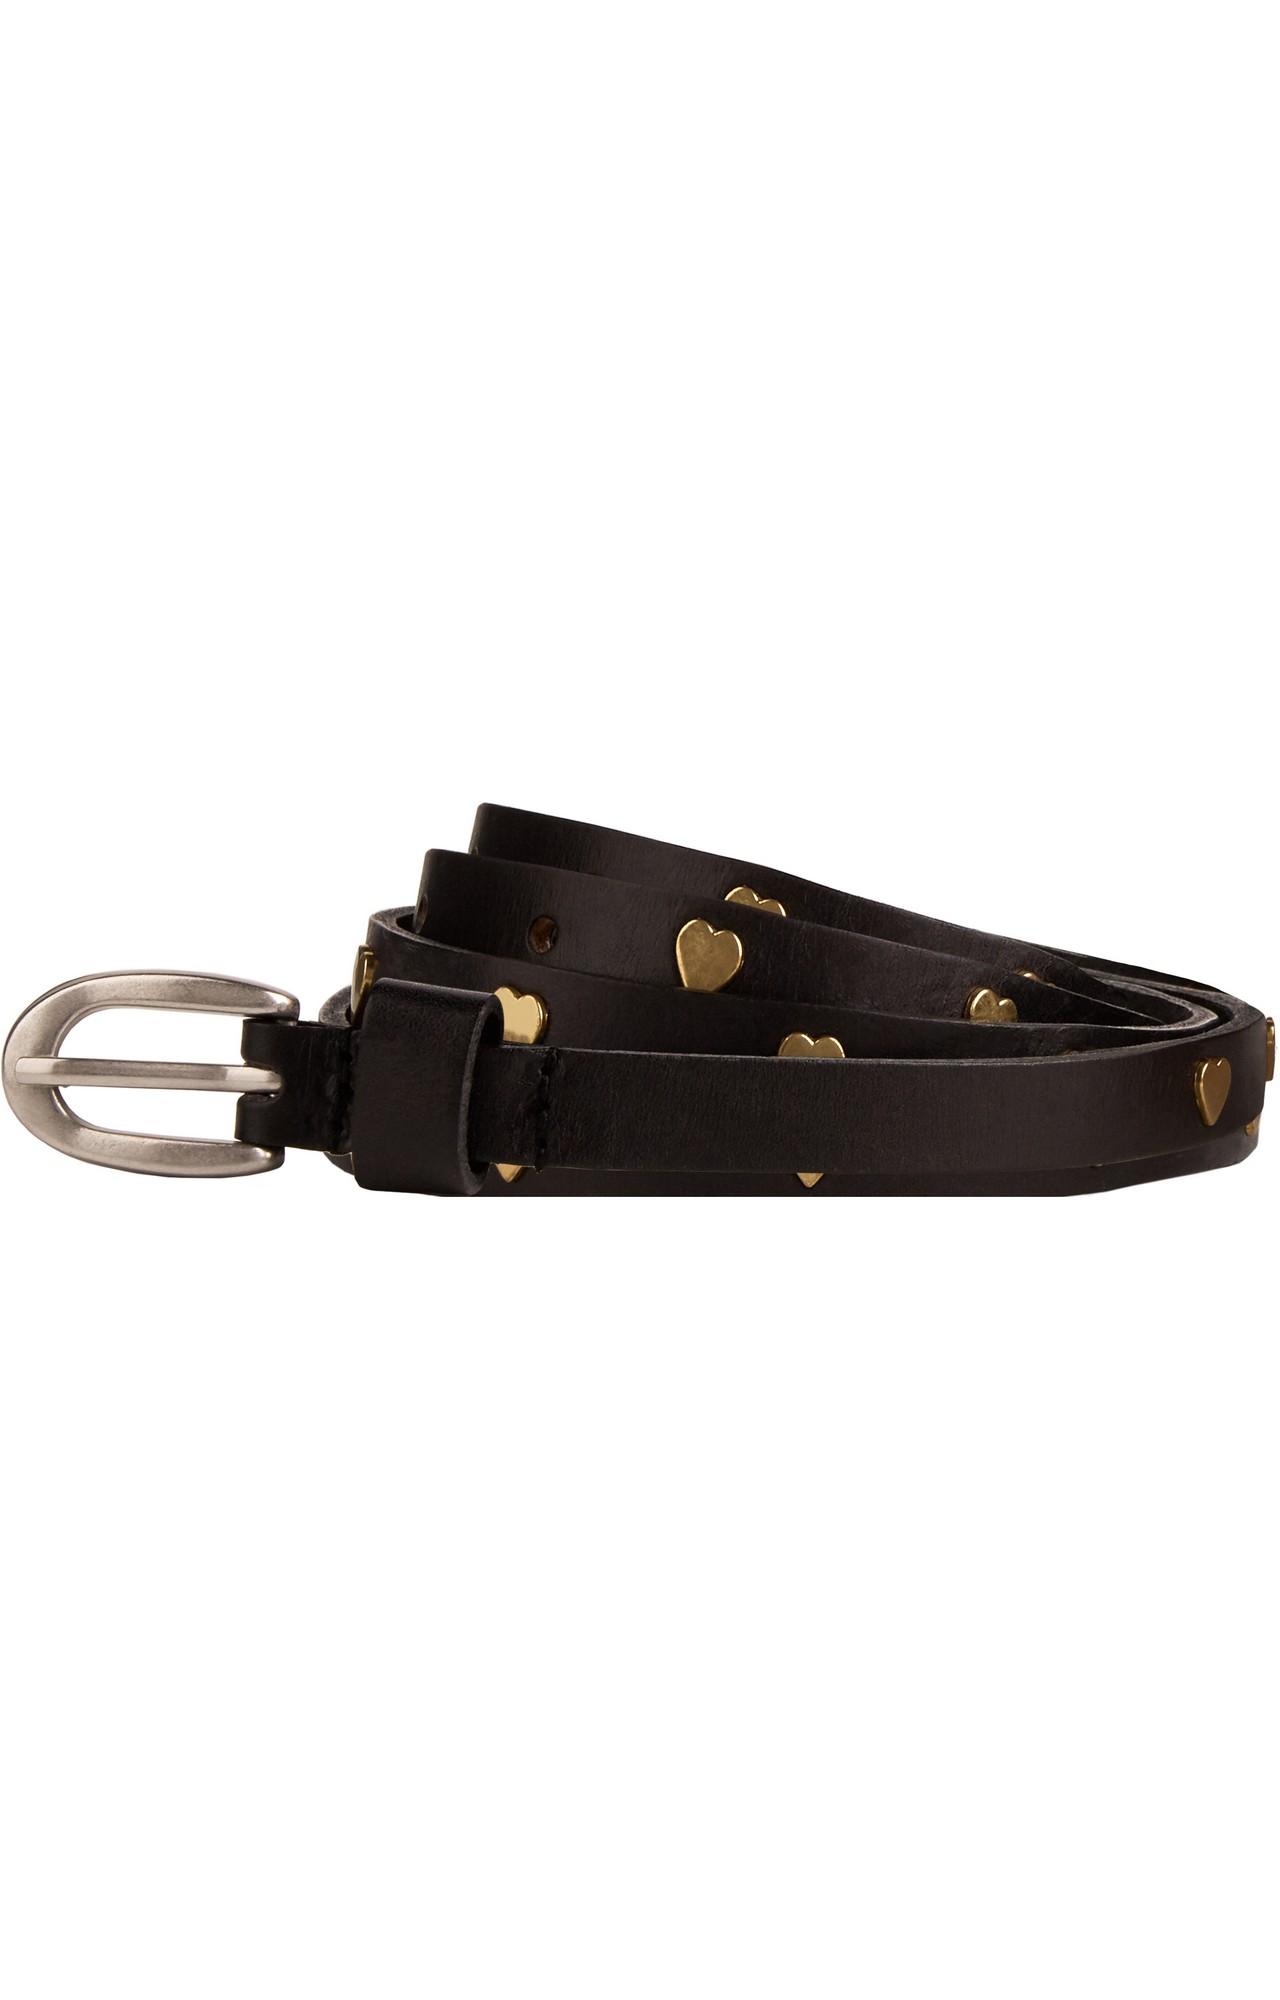 Scotch & Soda   thin leather belts with studs